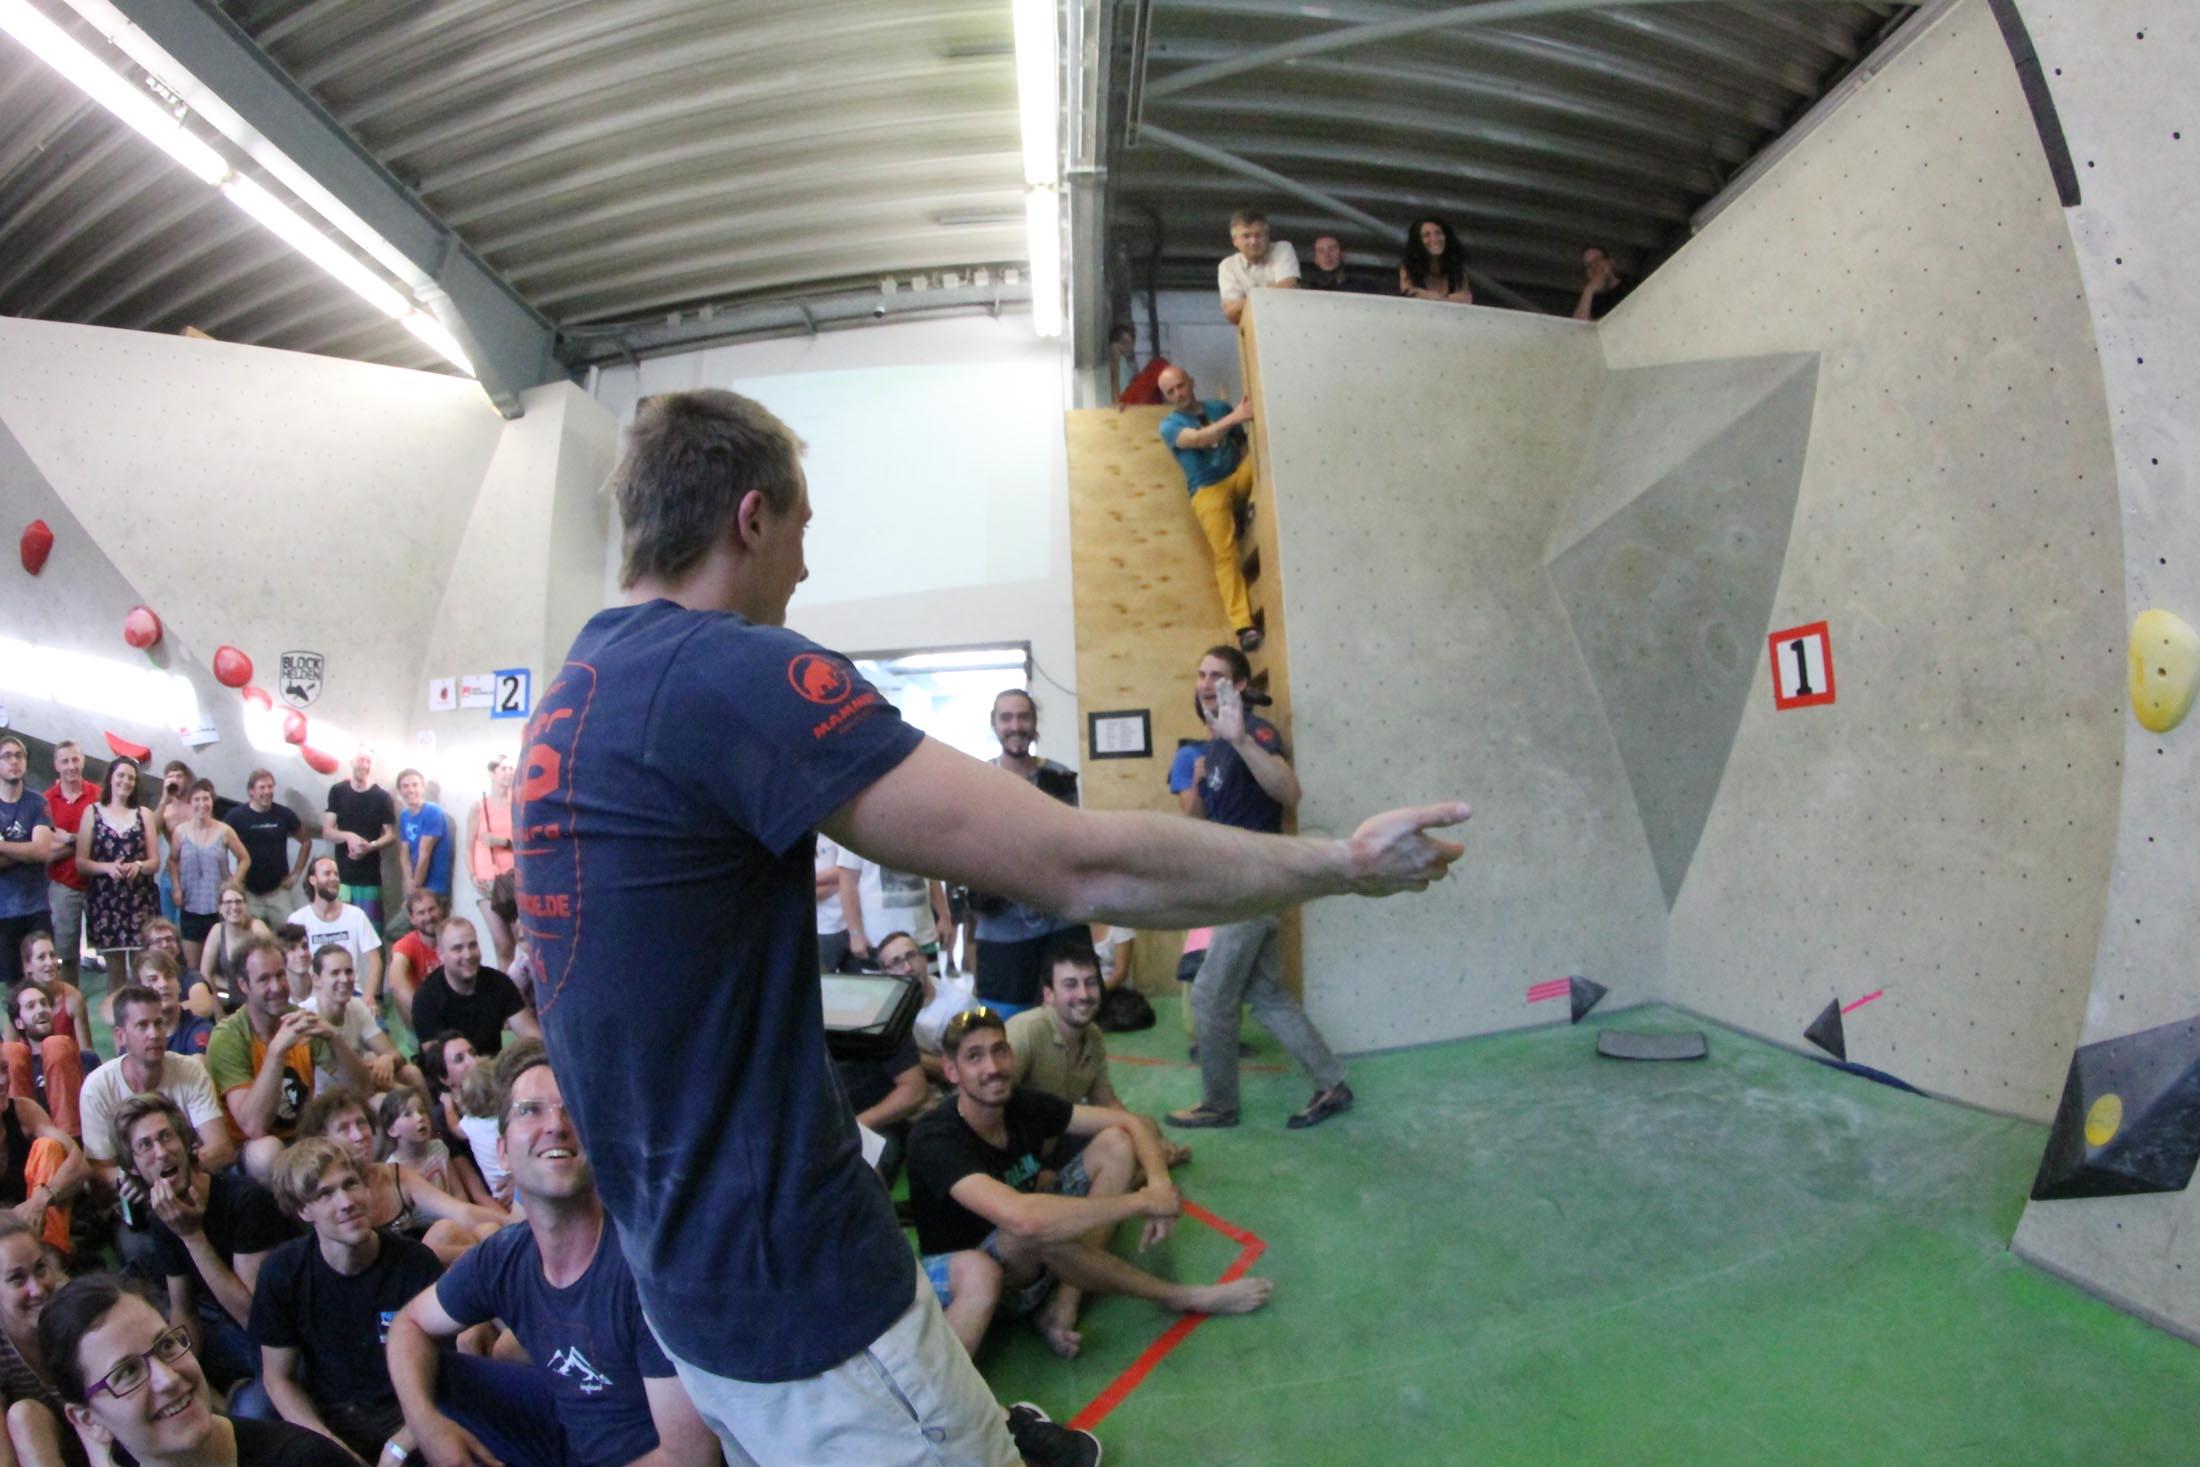 Finale, internationaler bouldercup Frankenjura 2016, BLOCKHELDEN Erlangen, Mammut, Bergfreunde.de, Boulderwettkampf07092016569